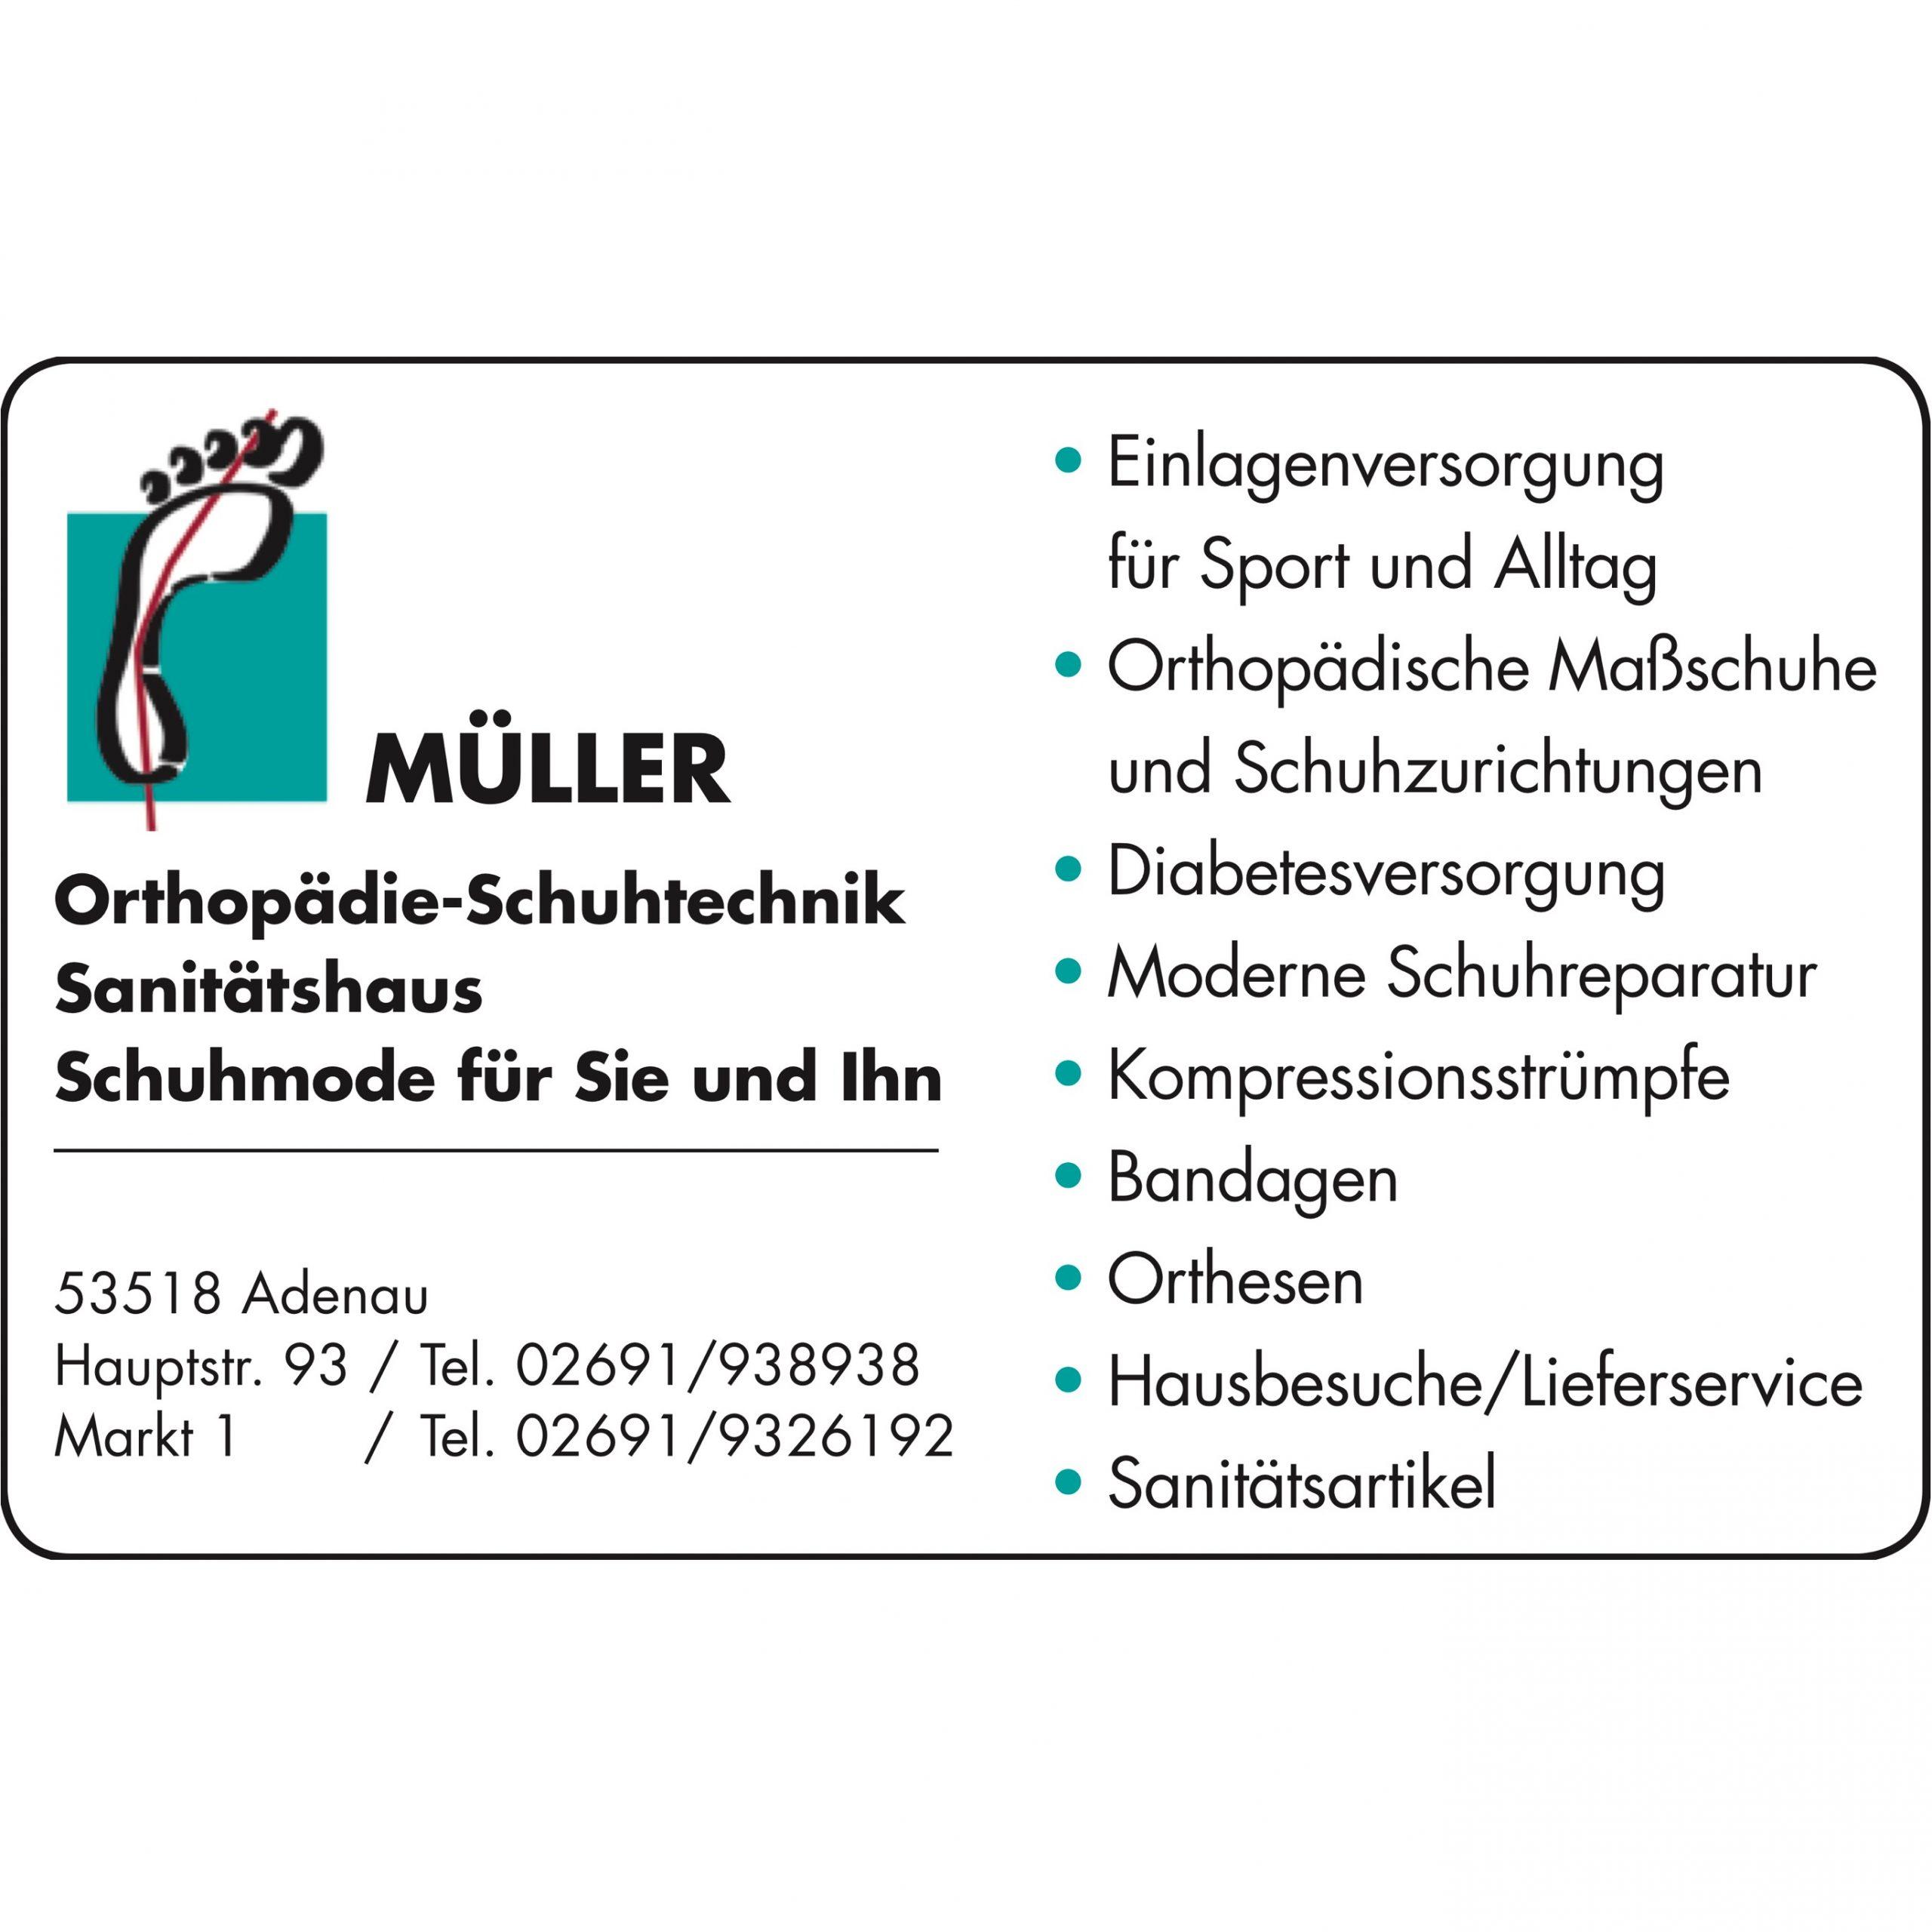 orthopaedie schuhtechnik mueller01 scaled